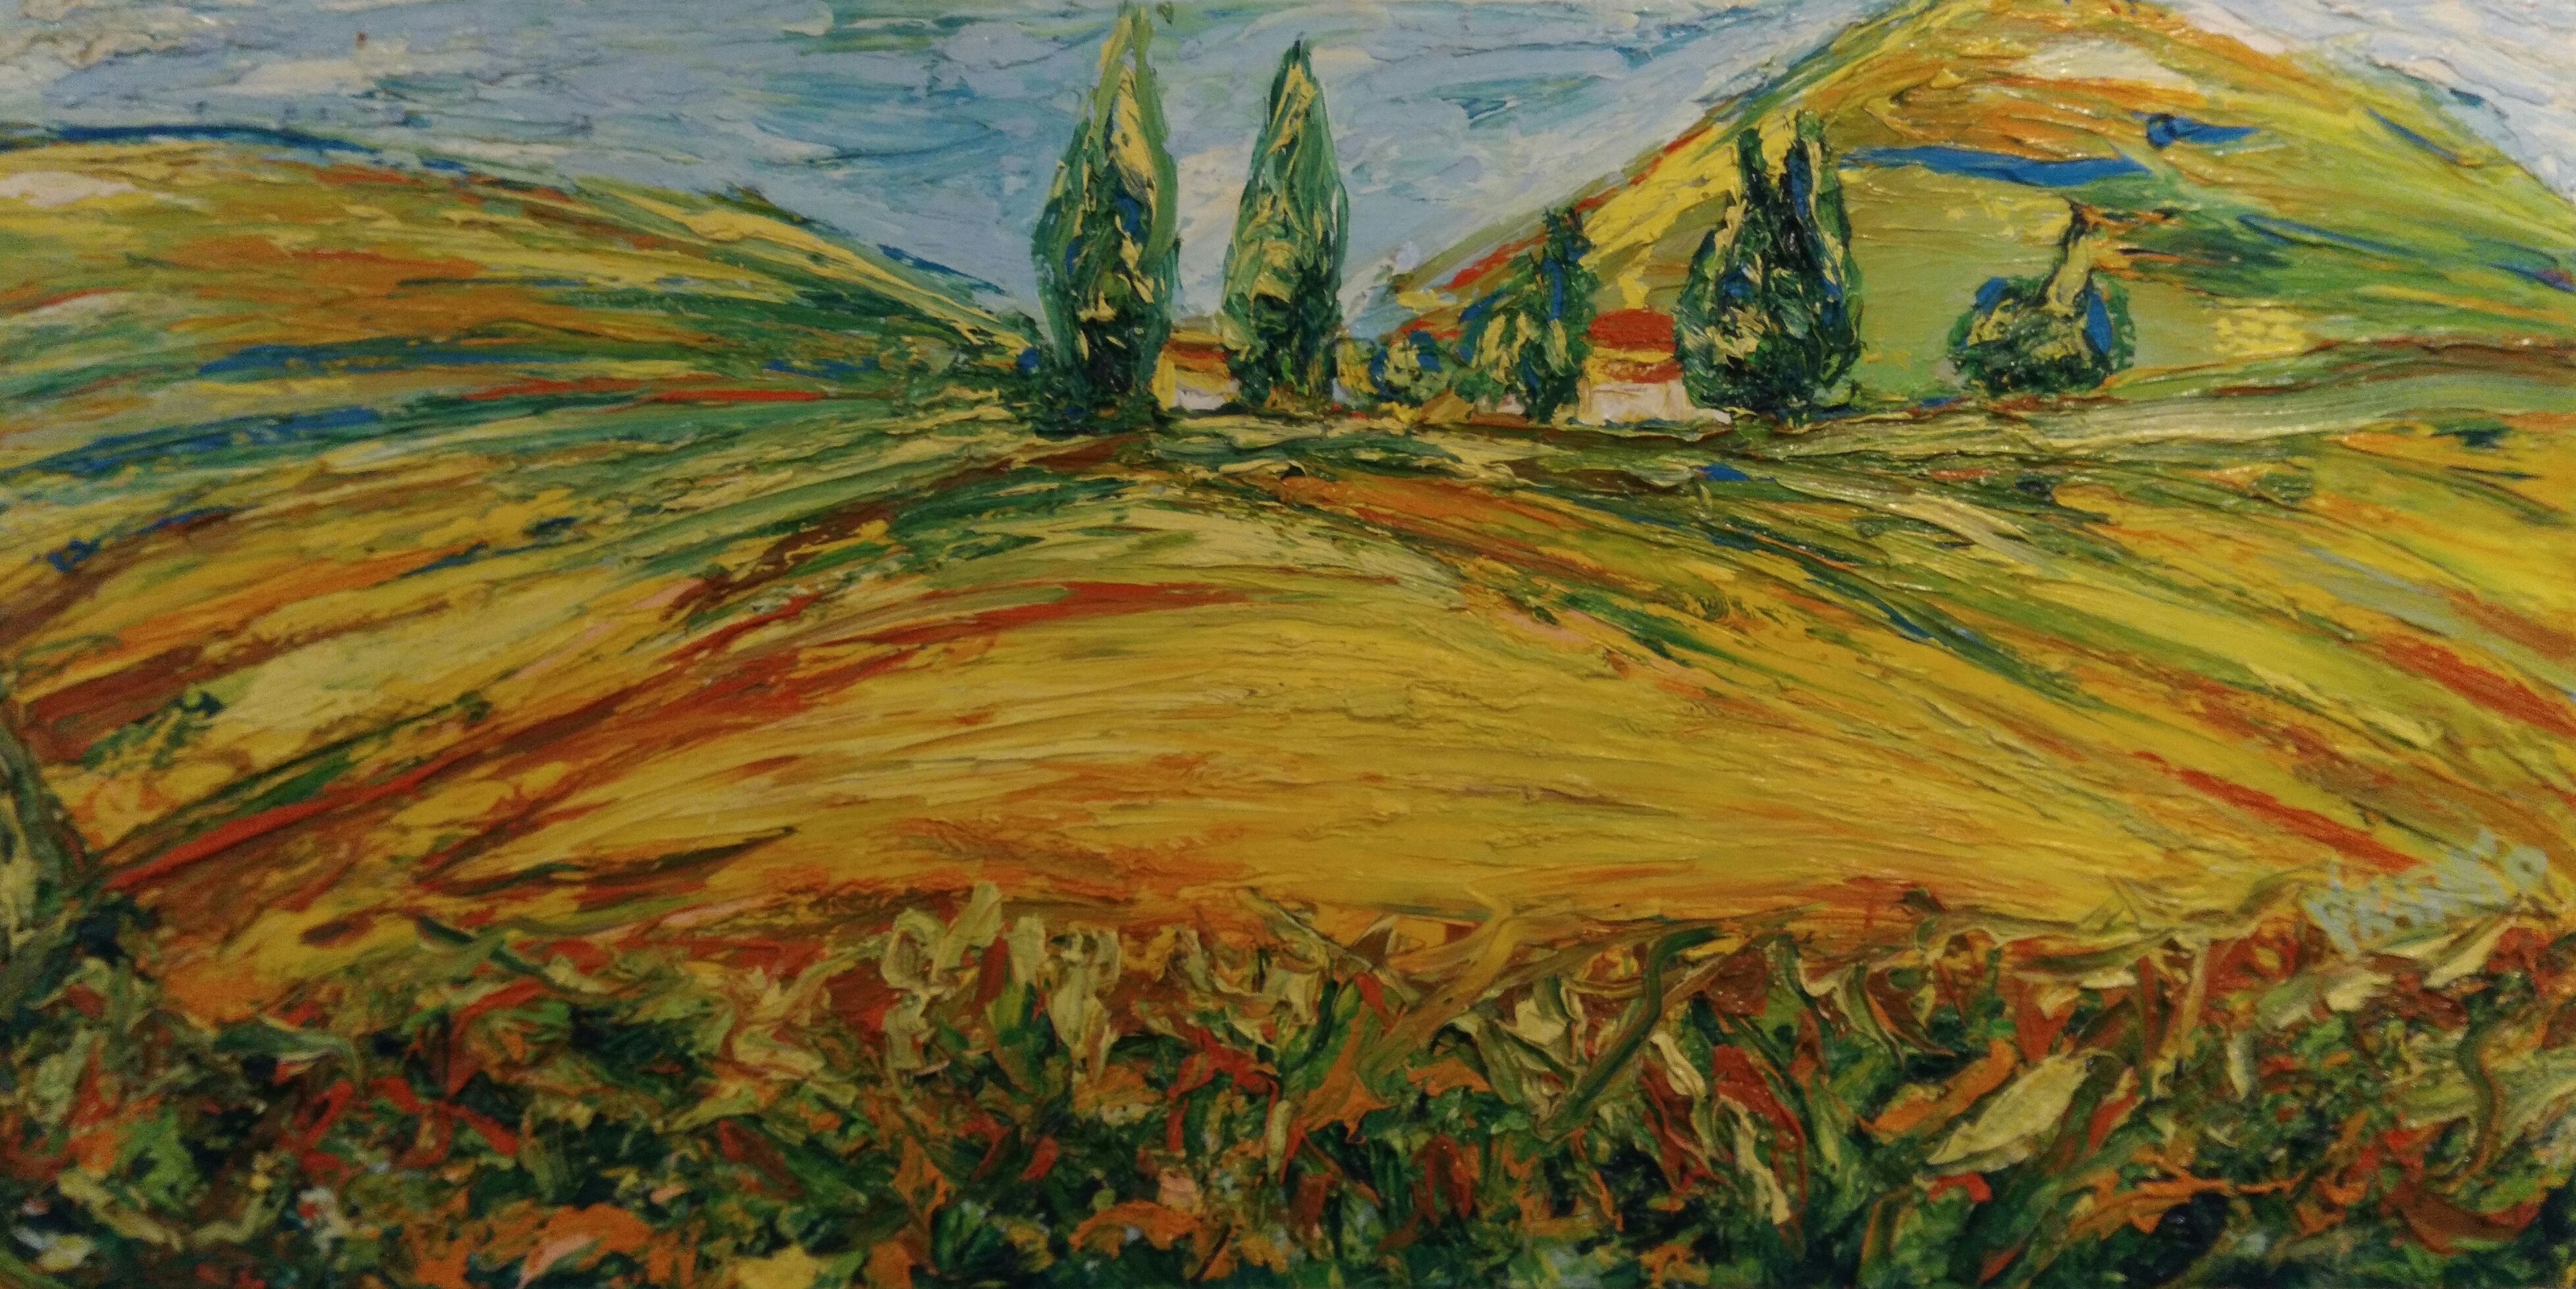 Toscana I olio su tela  40x80cm 2014